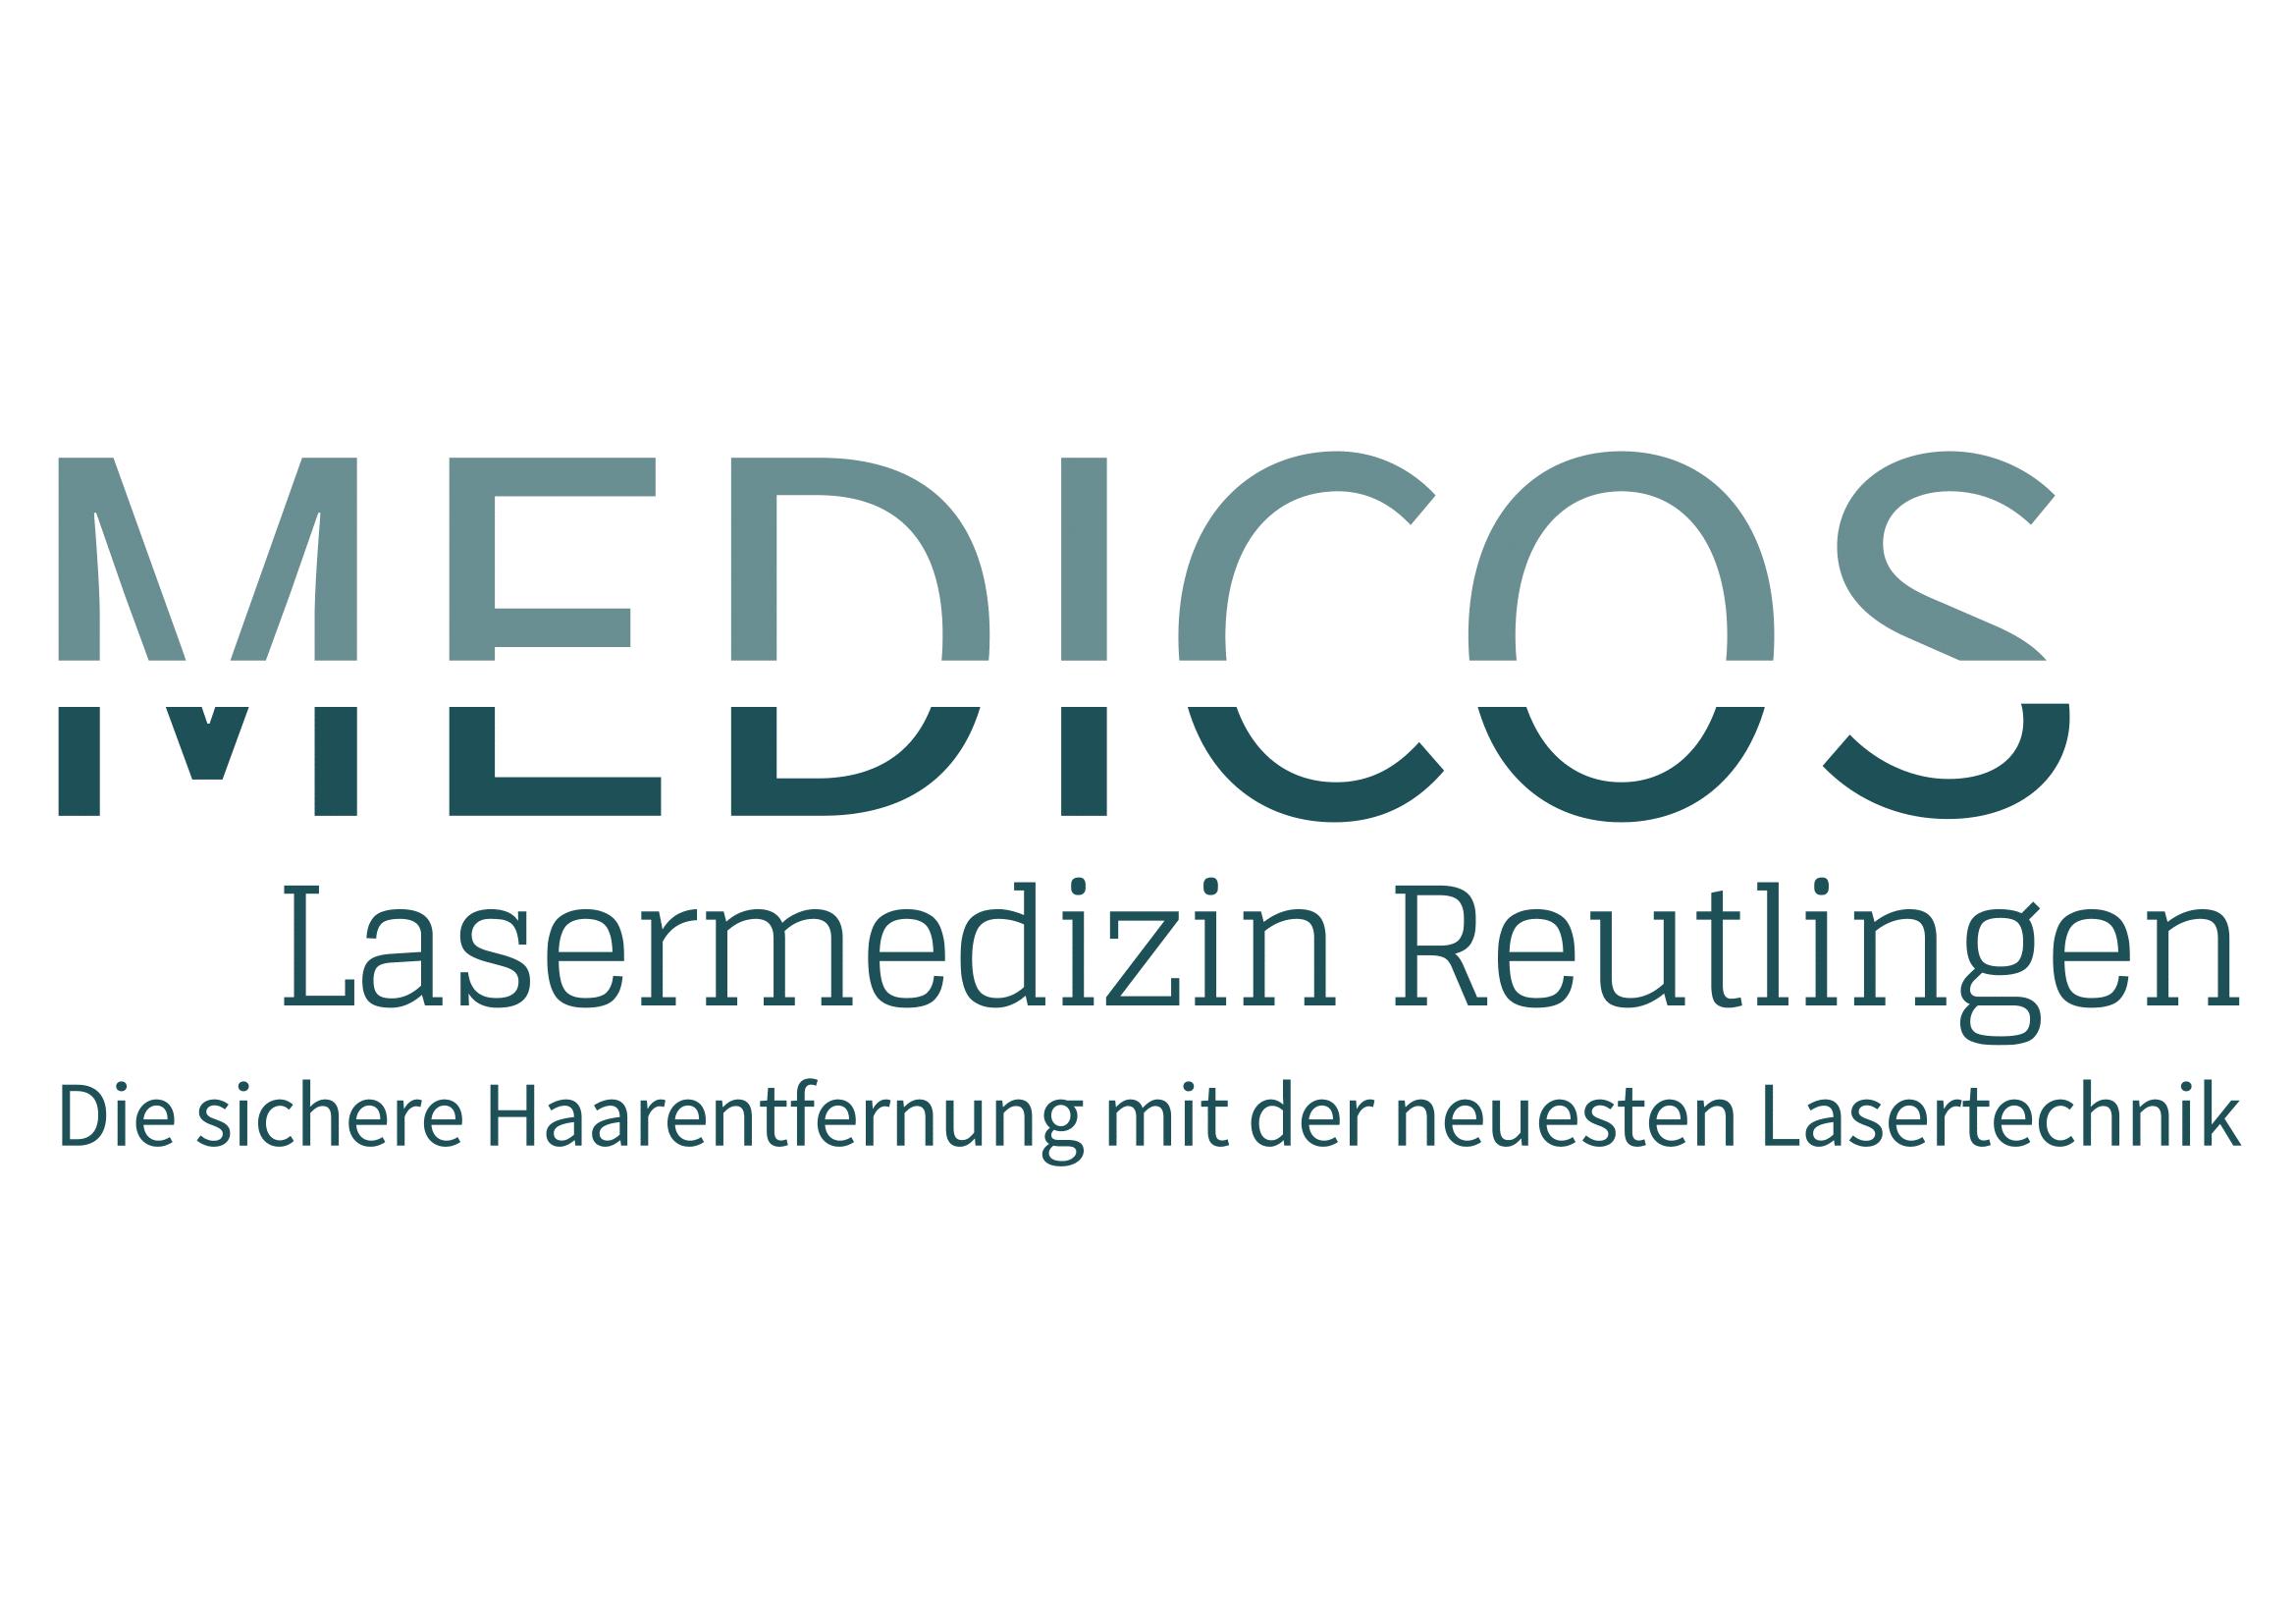 Medicos -  final-1.png